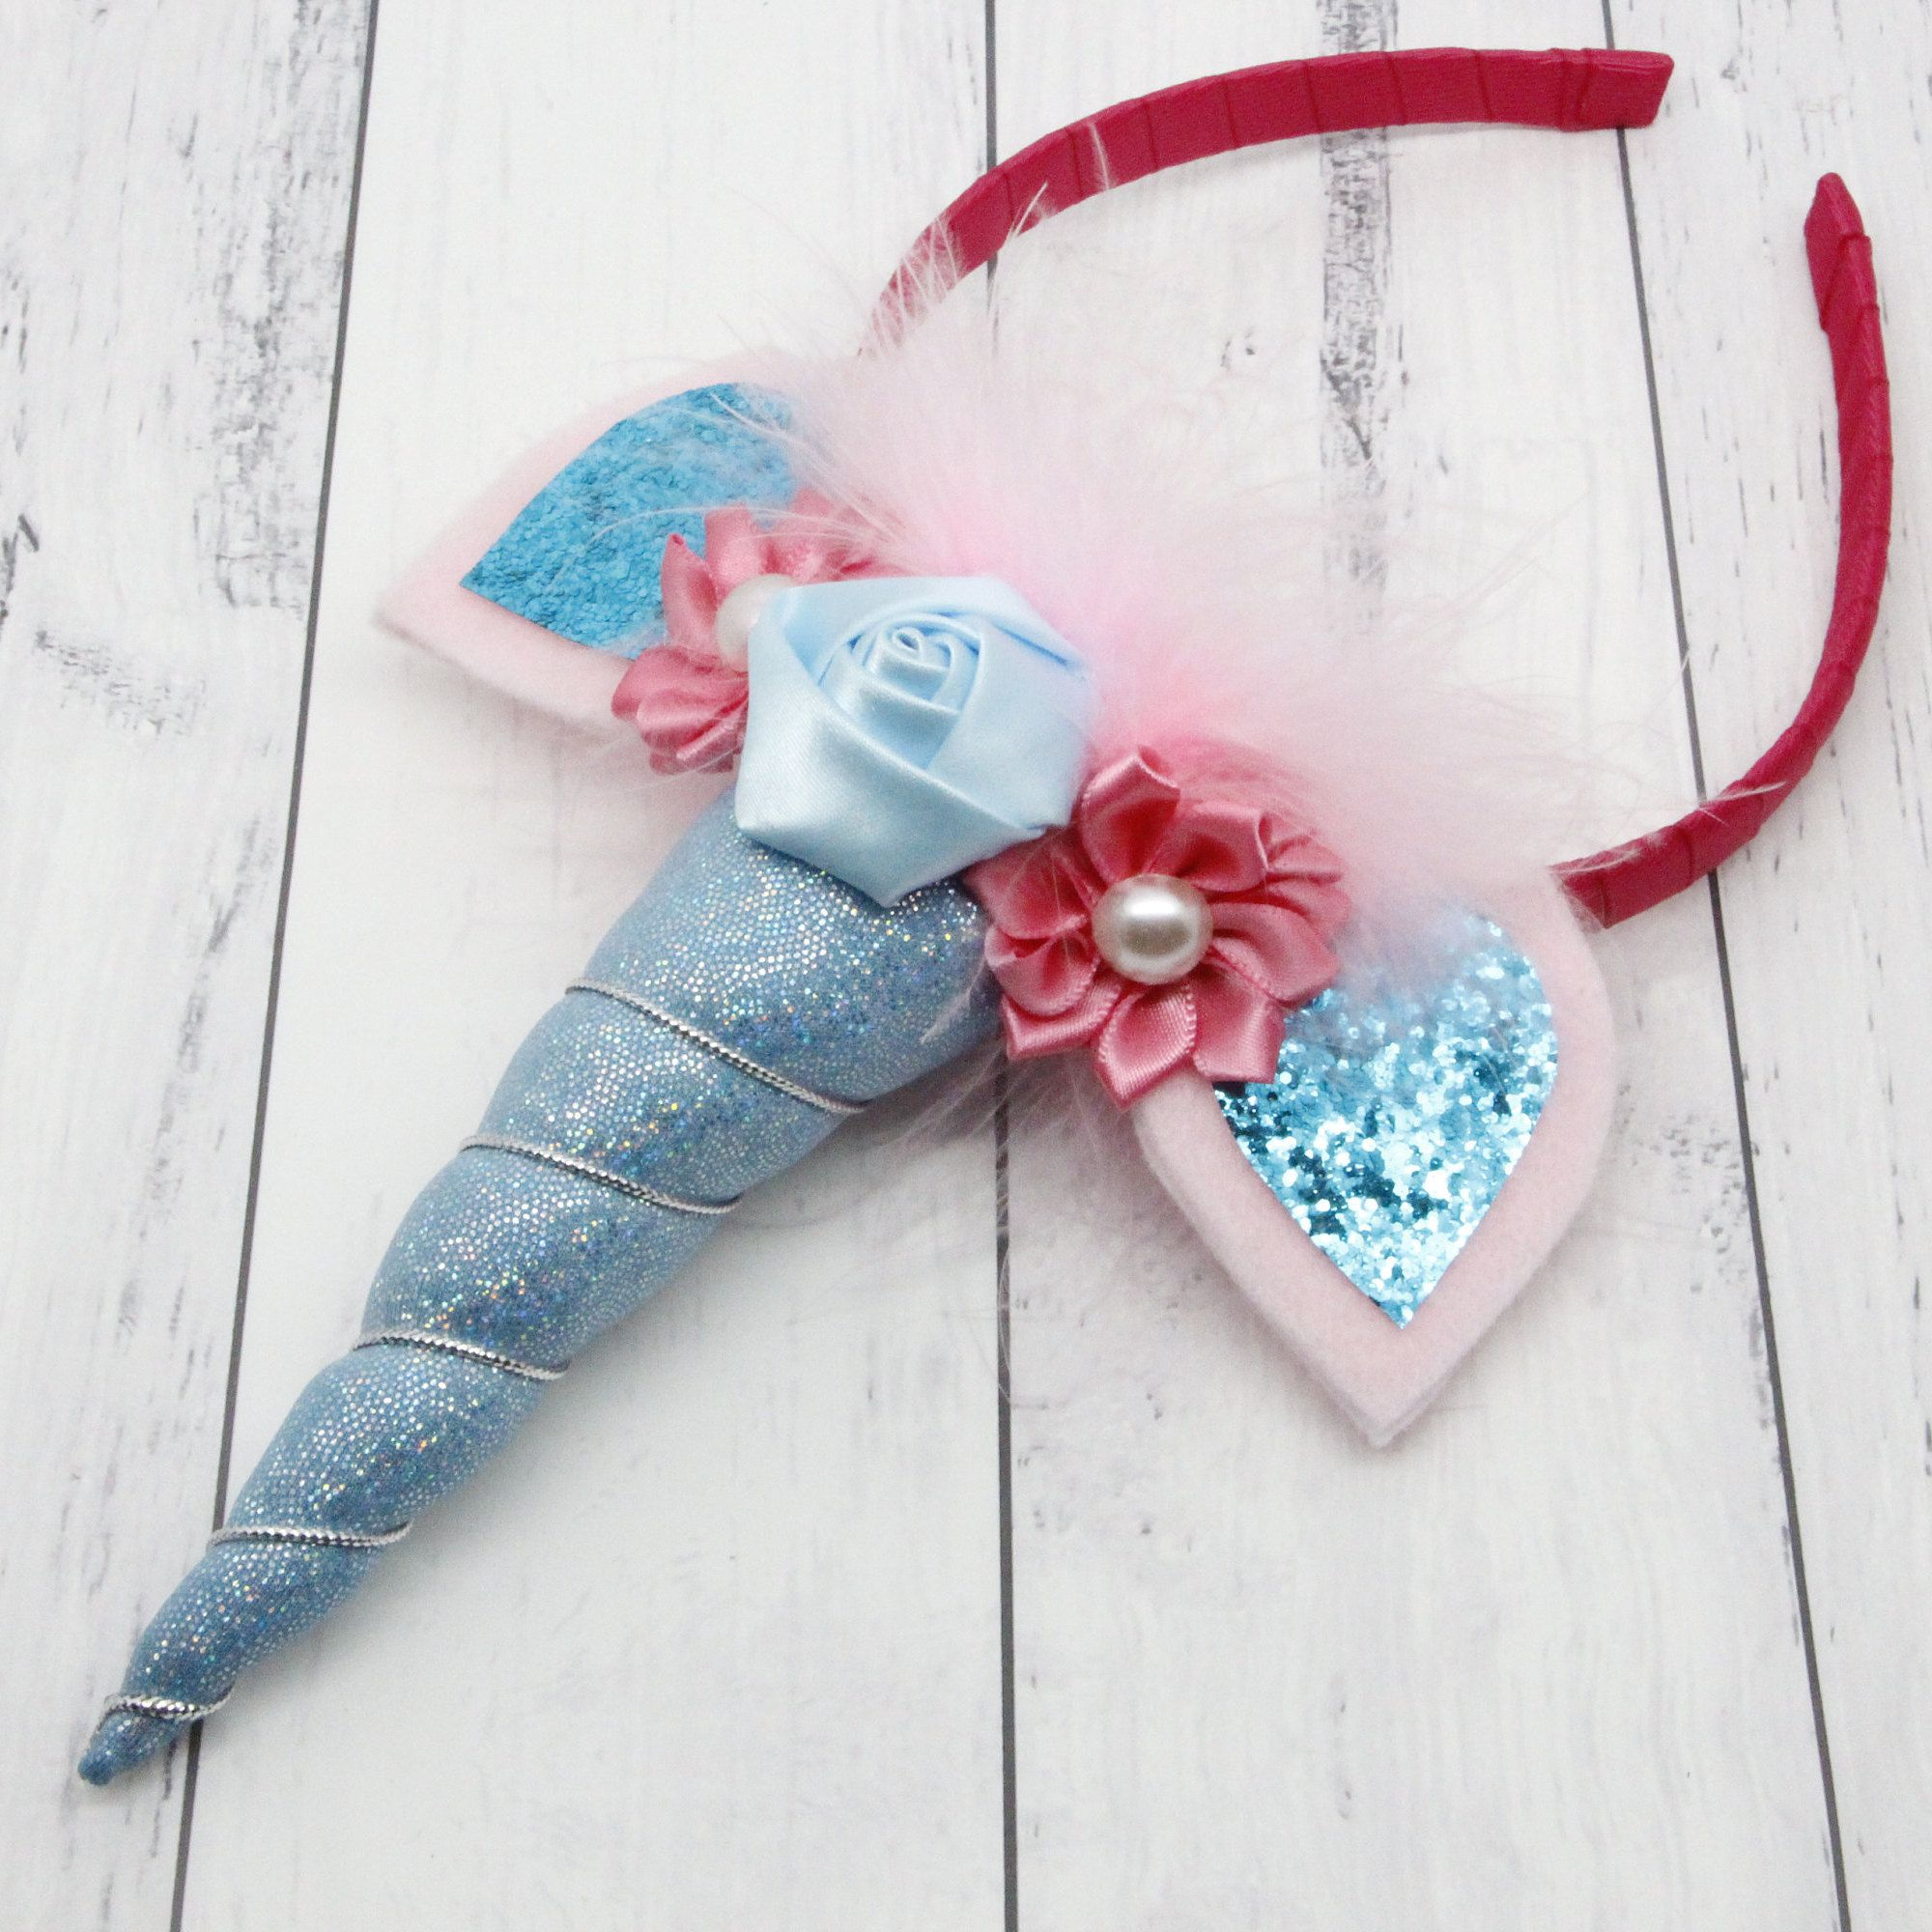 Party Outfit. Mermaid Hair Accessory Girls Unicorn Horn Headband